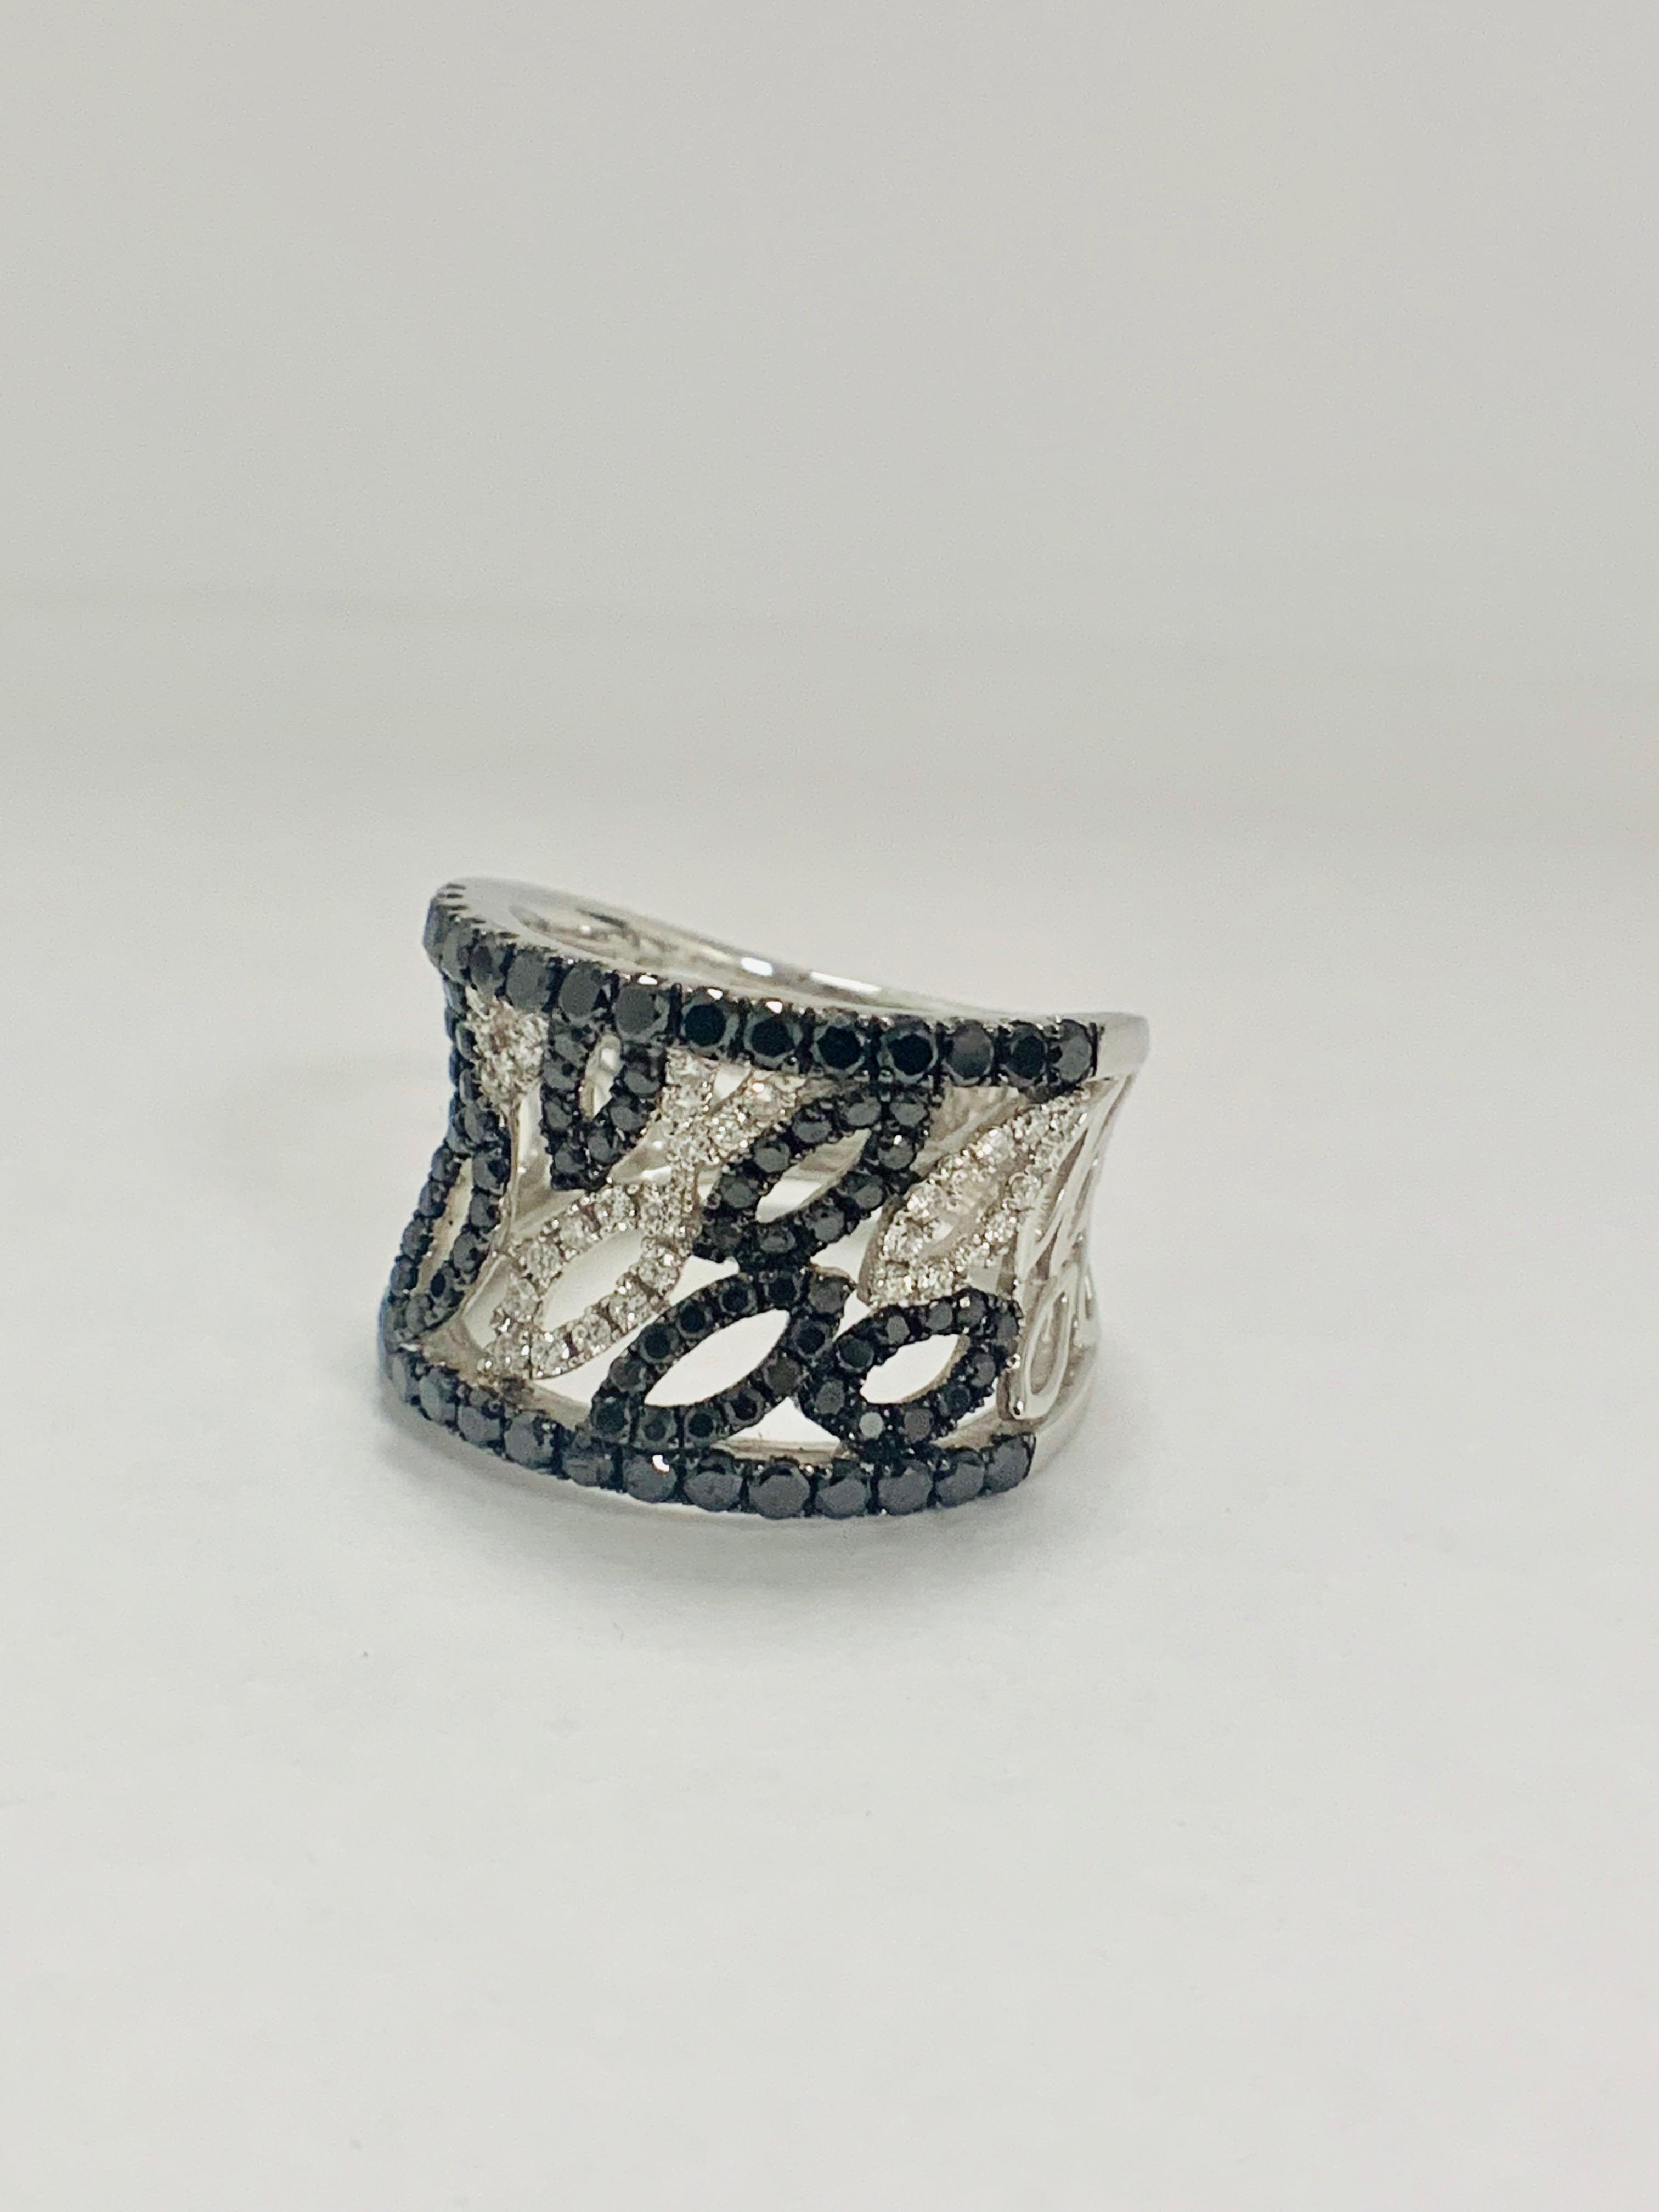 18ct White Gold Diamond ring featuring 90 round cut, black Diamonds (1.14ct TBDW) - Image 4 of 15